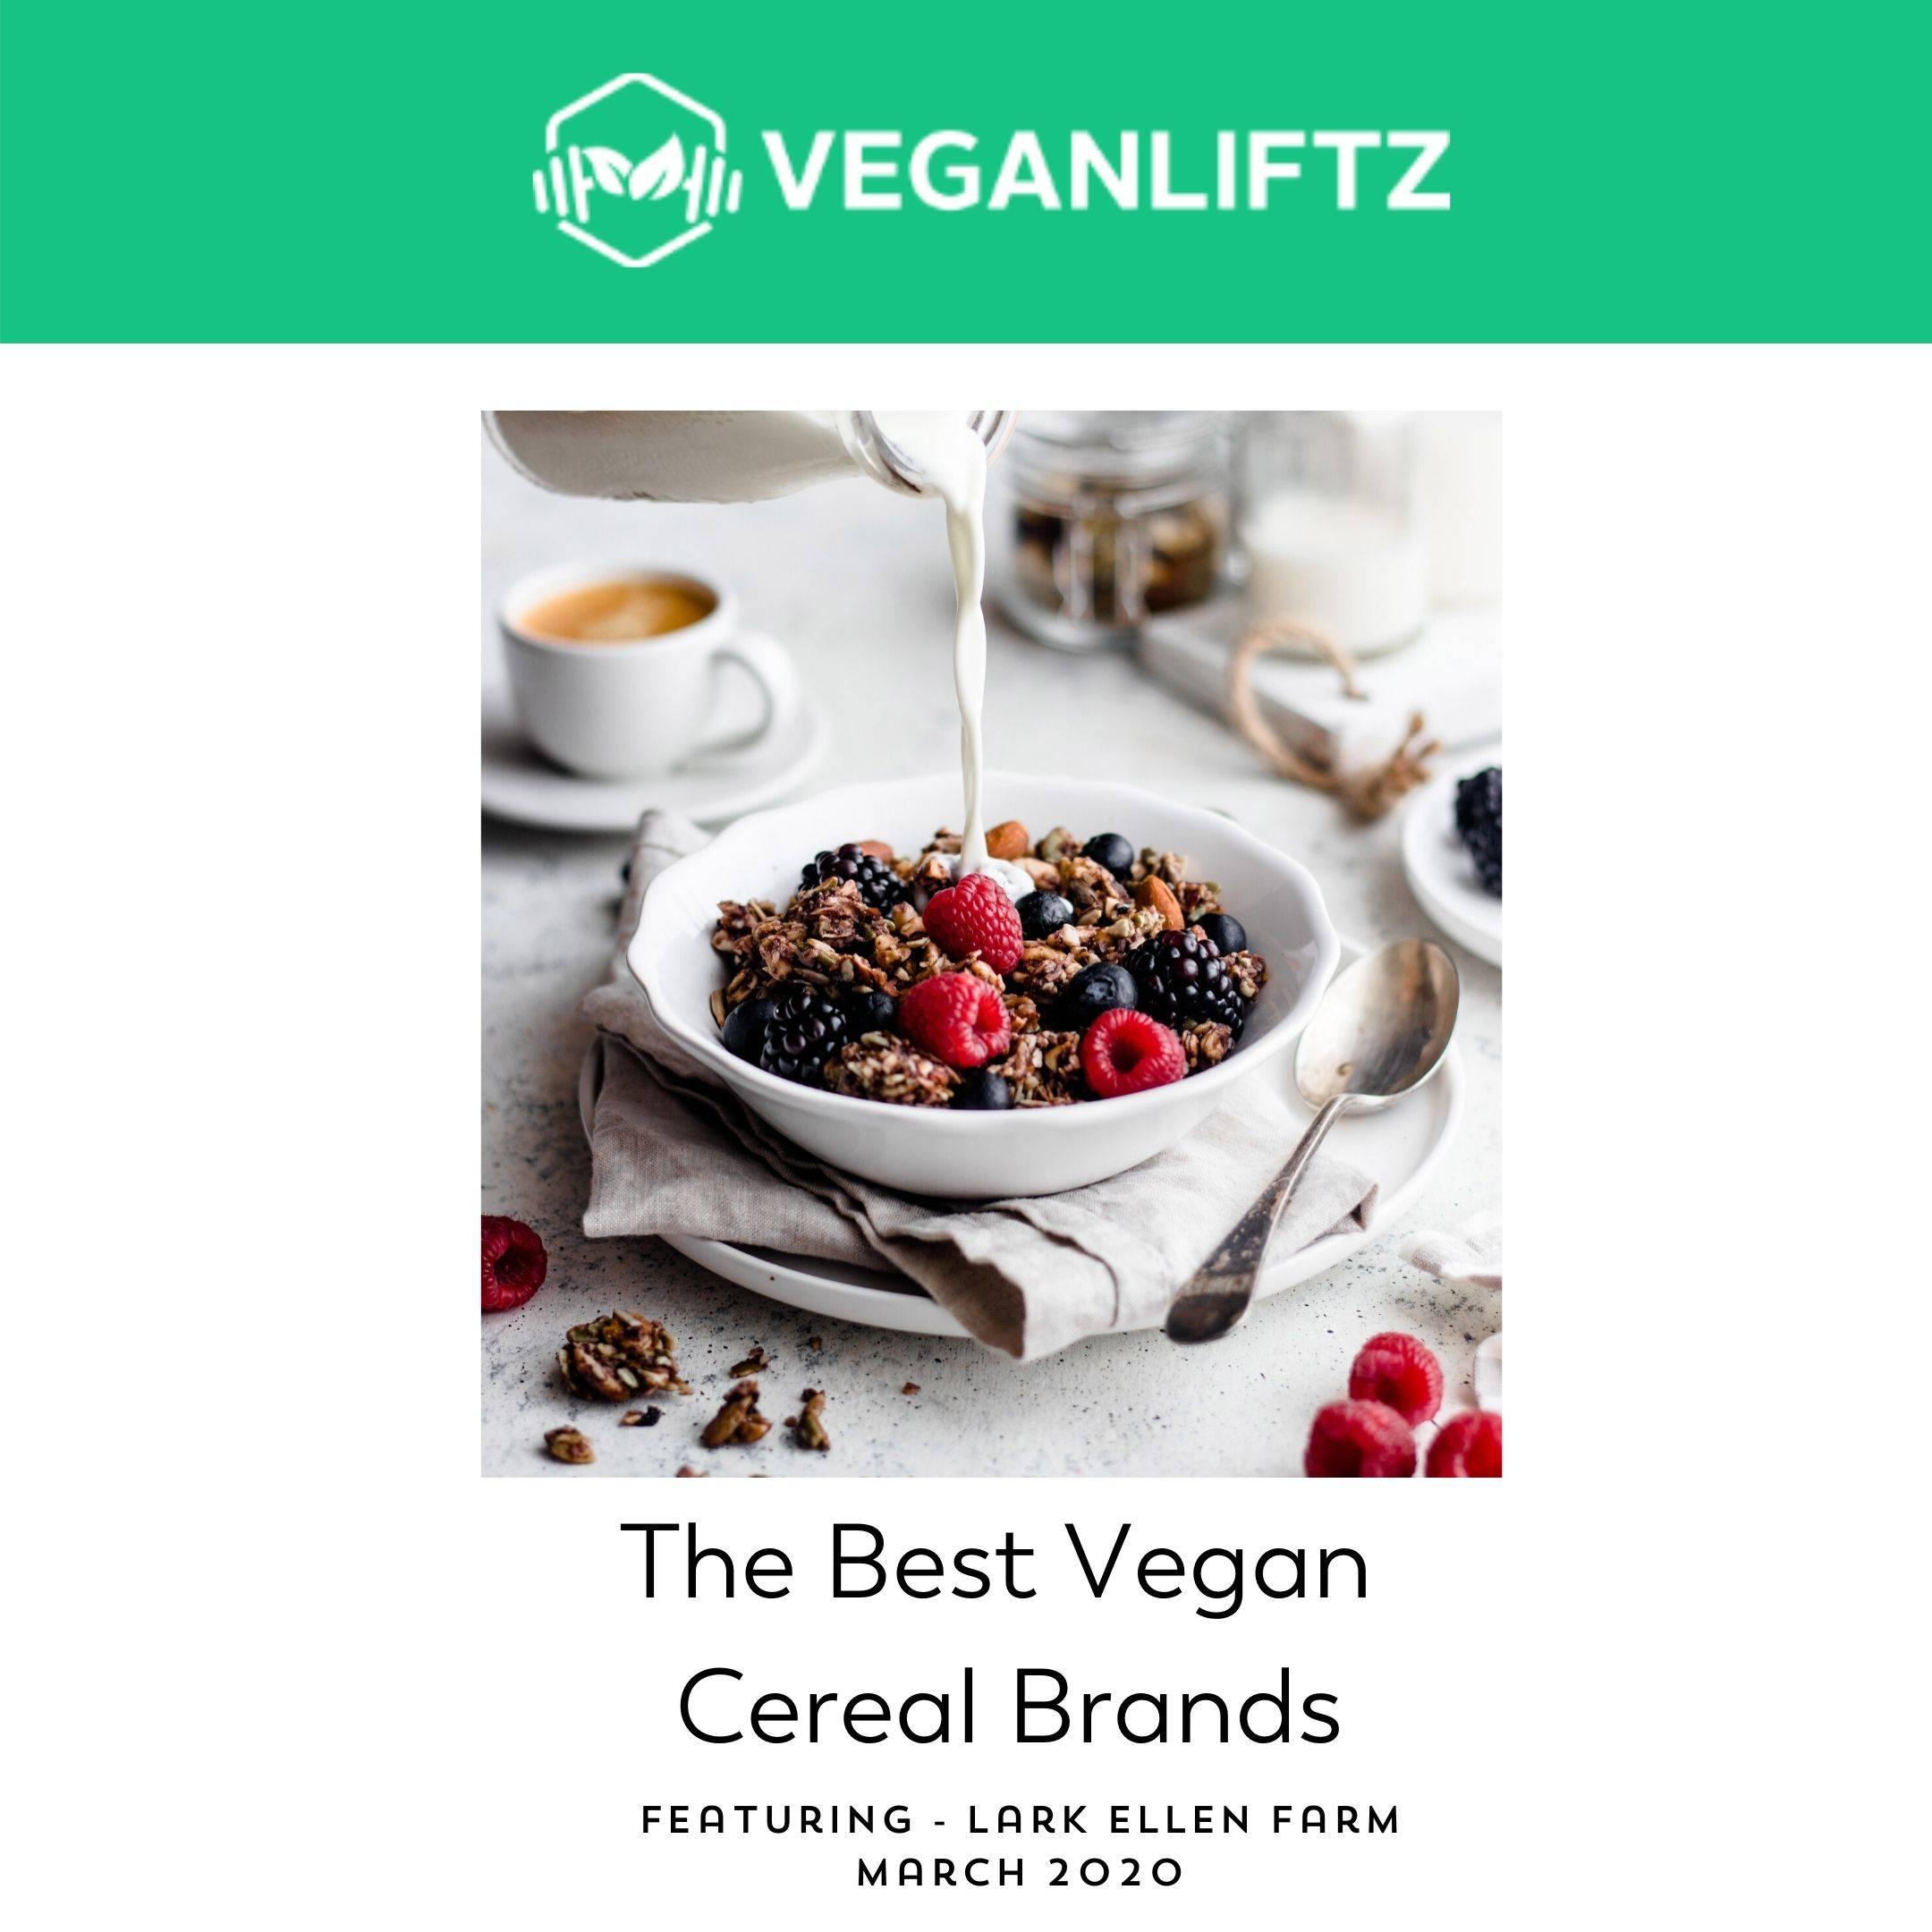 Veganliftz best vegan cereal brands